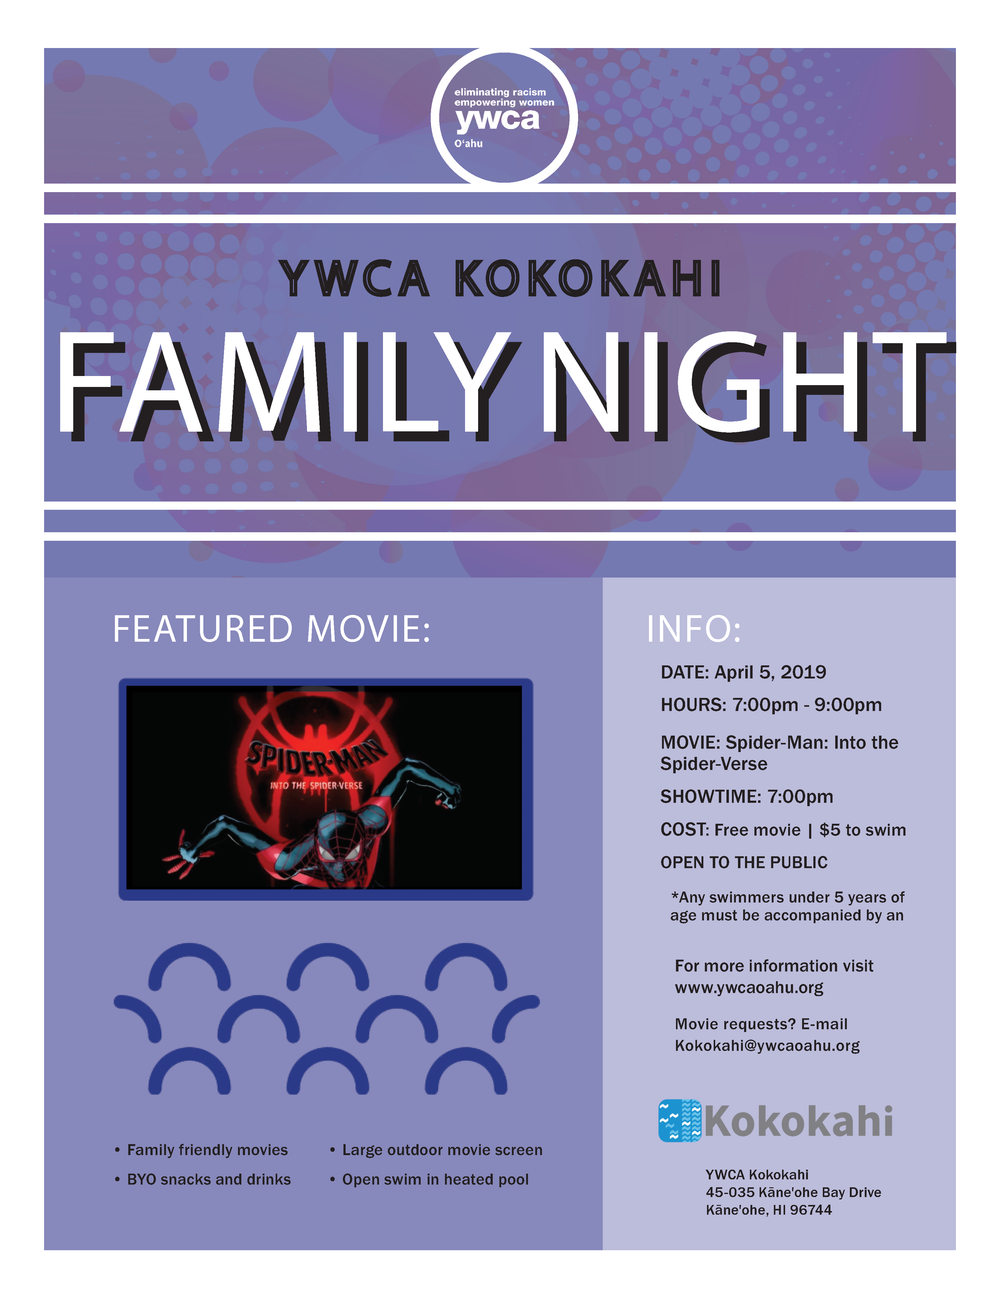 Kokokahi Family Night flyer Apr 05 2019.png